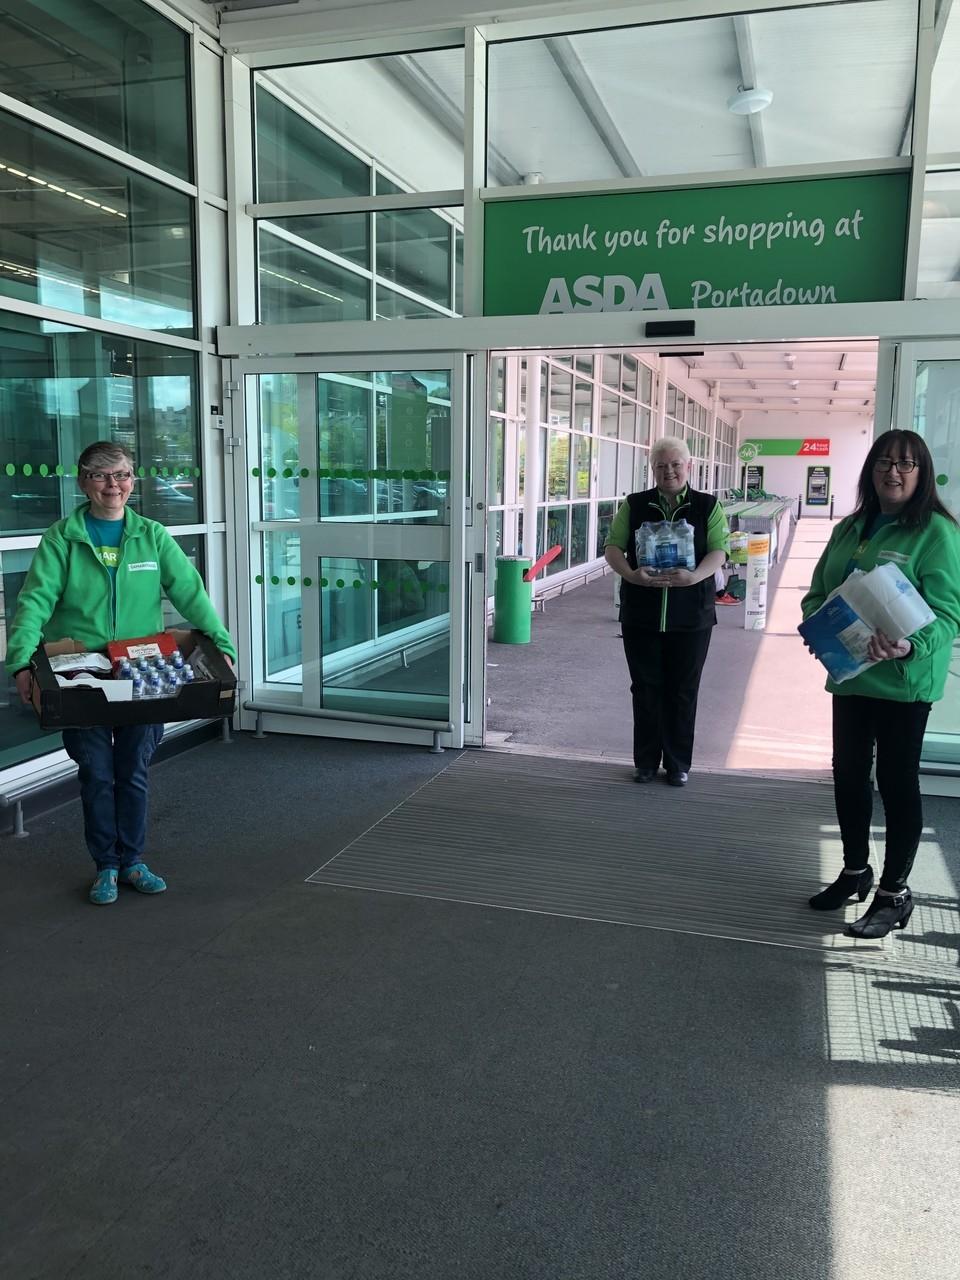 Craigavon Samaritans Branch | Asda Portadown